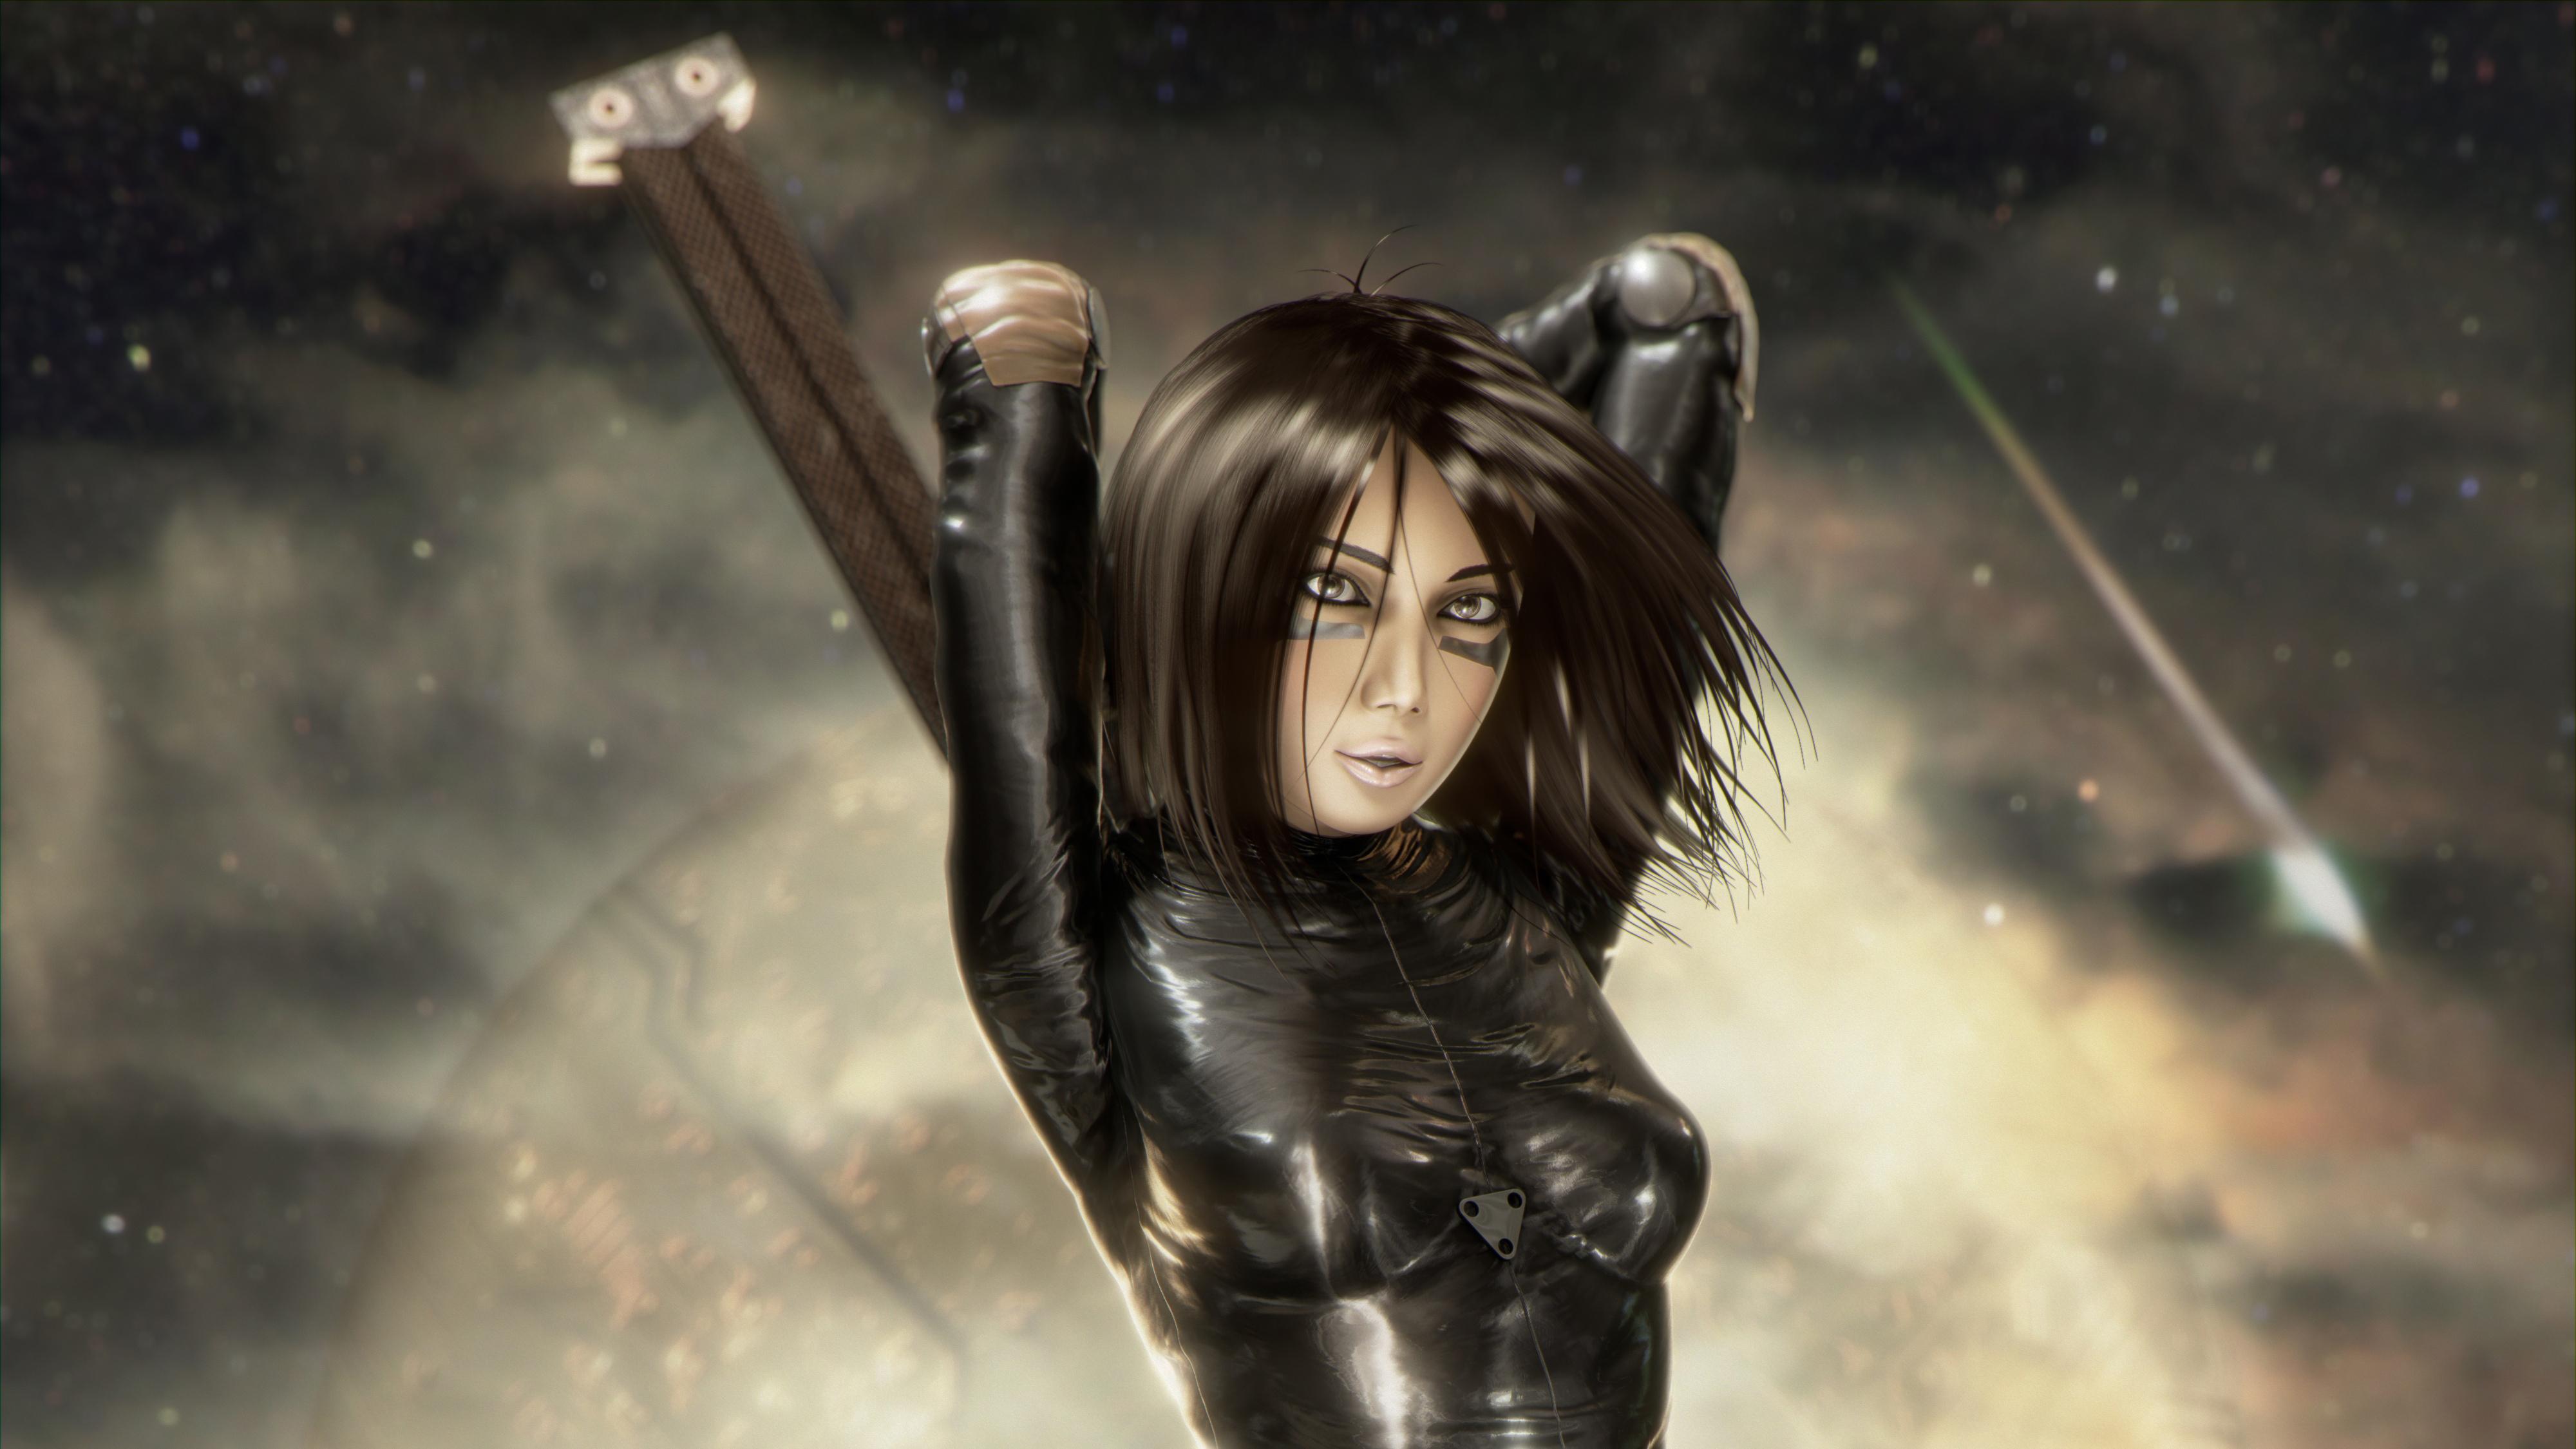 Alita Battle Angel 4k Artwork, HD Artist, 4k Wallpapers ...